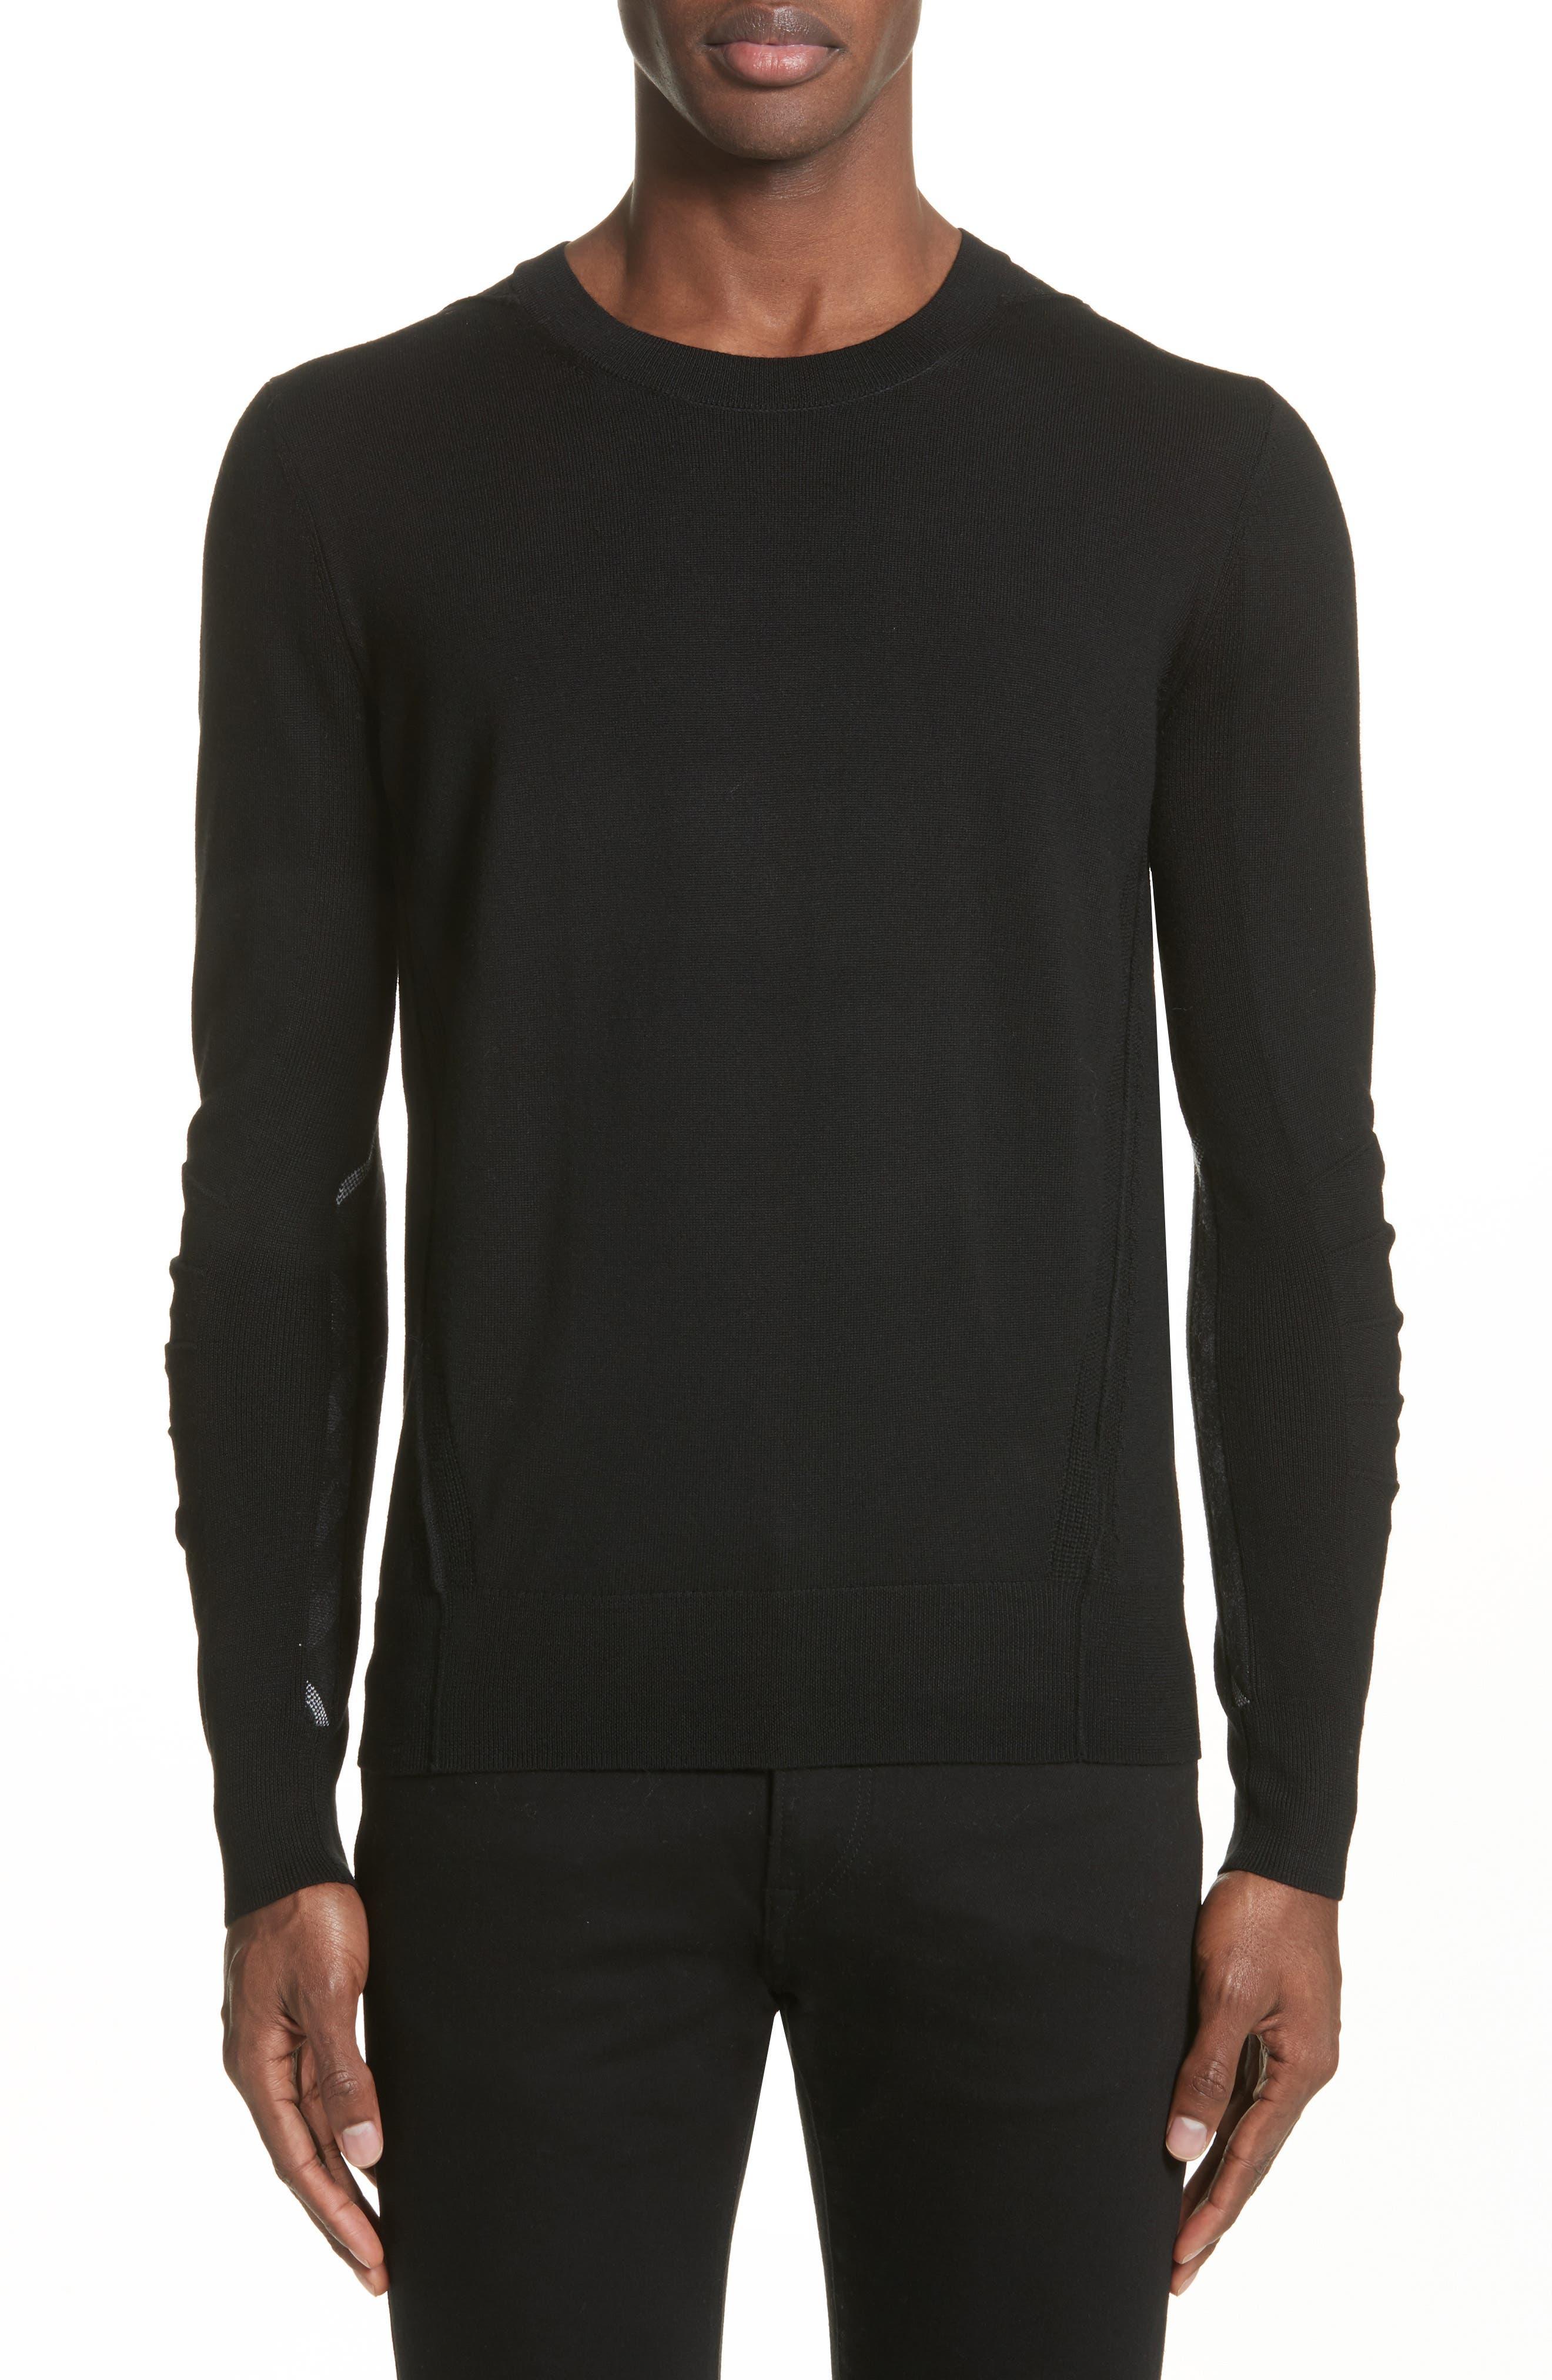 Alternate Image 1 Selected - Burberry Carter Merino Wool Crewneck Sweater